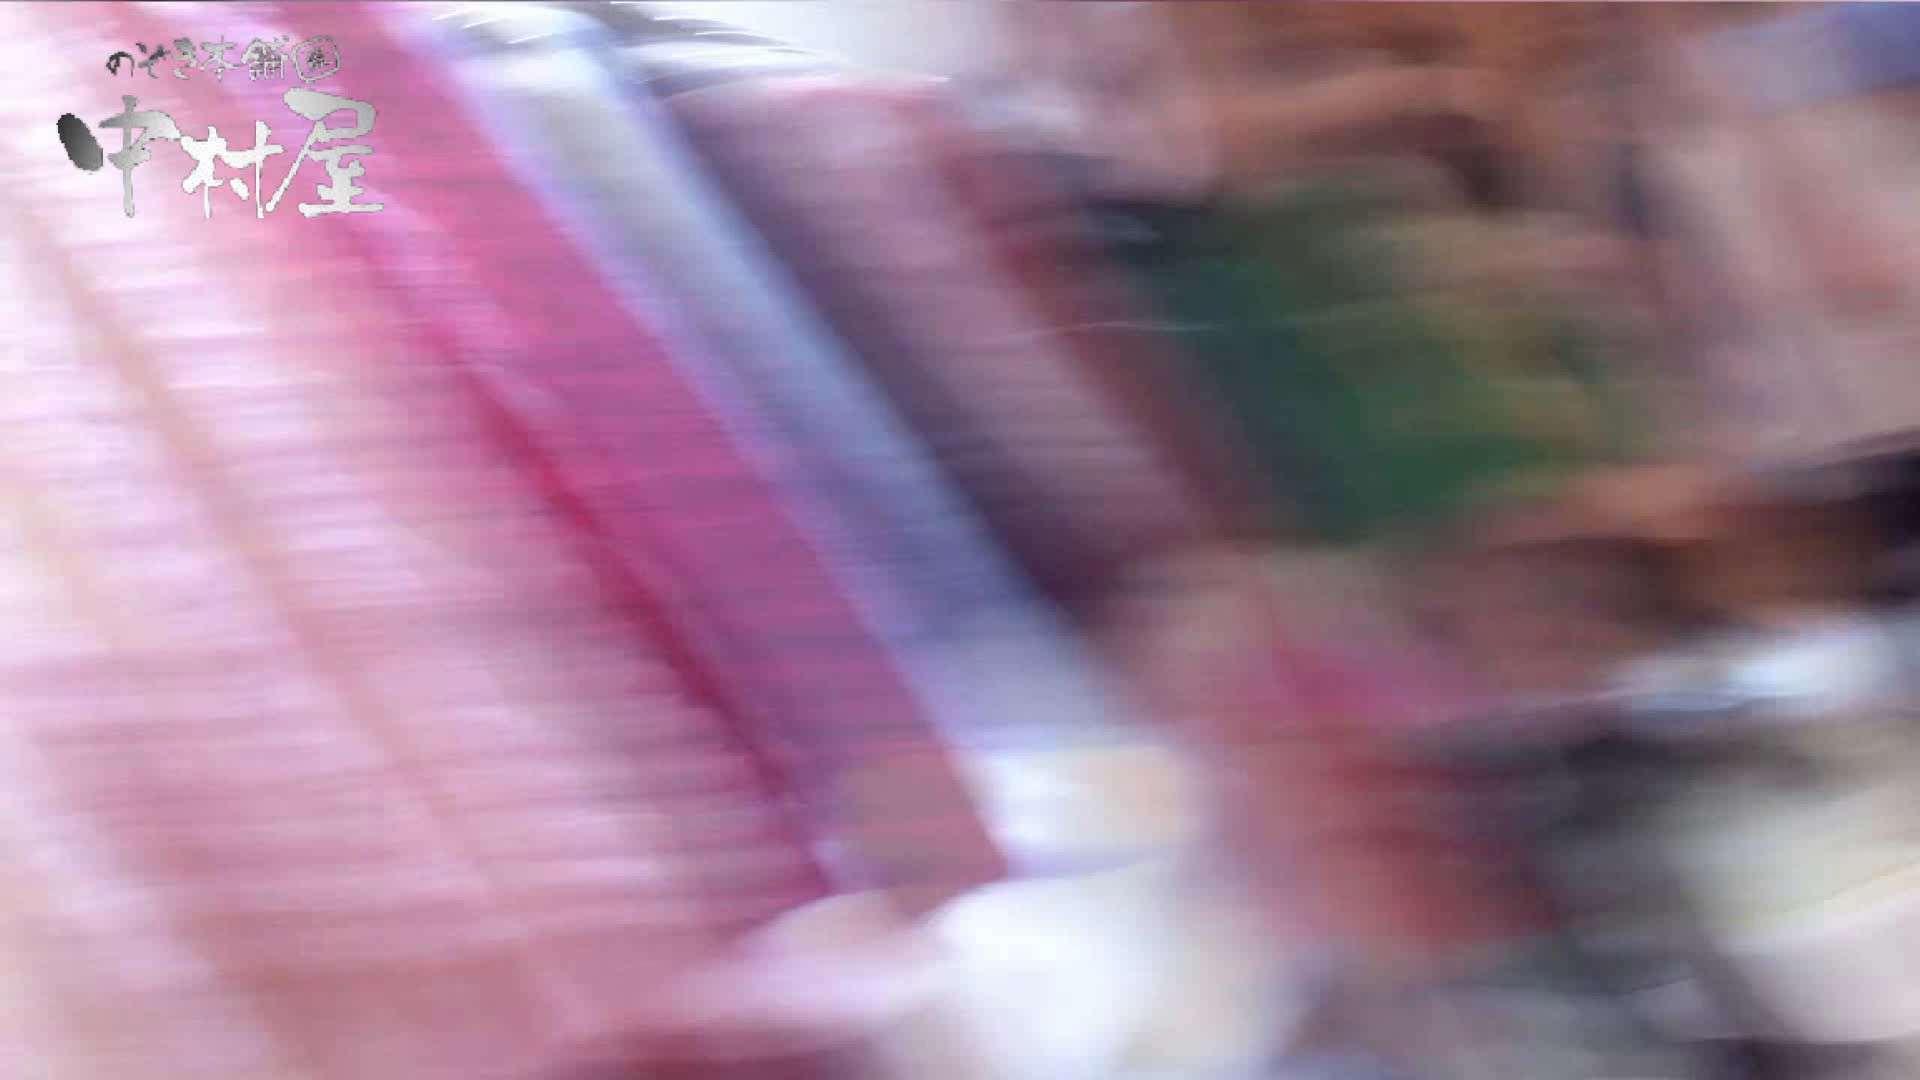 vol.49 可愛いカリスマ店員‼胸チラ&パンチラ お嬢様系店員さん パンチラ セックス無修正動画無料 10枚 3